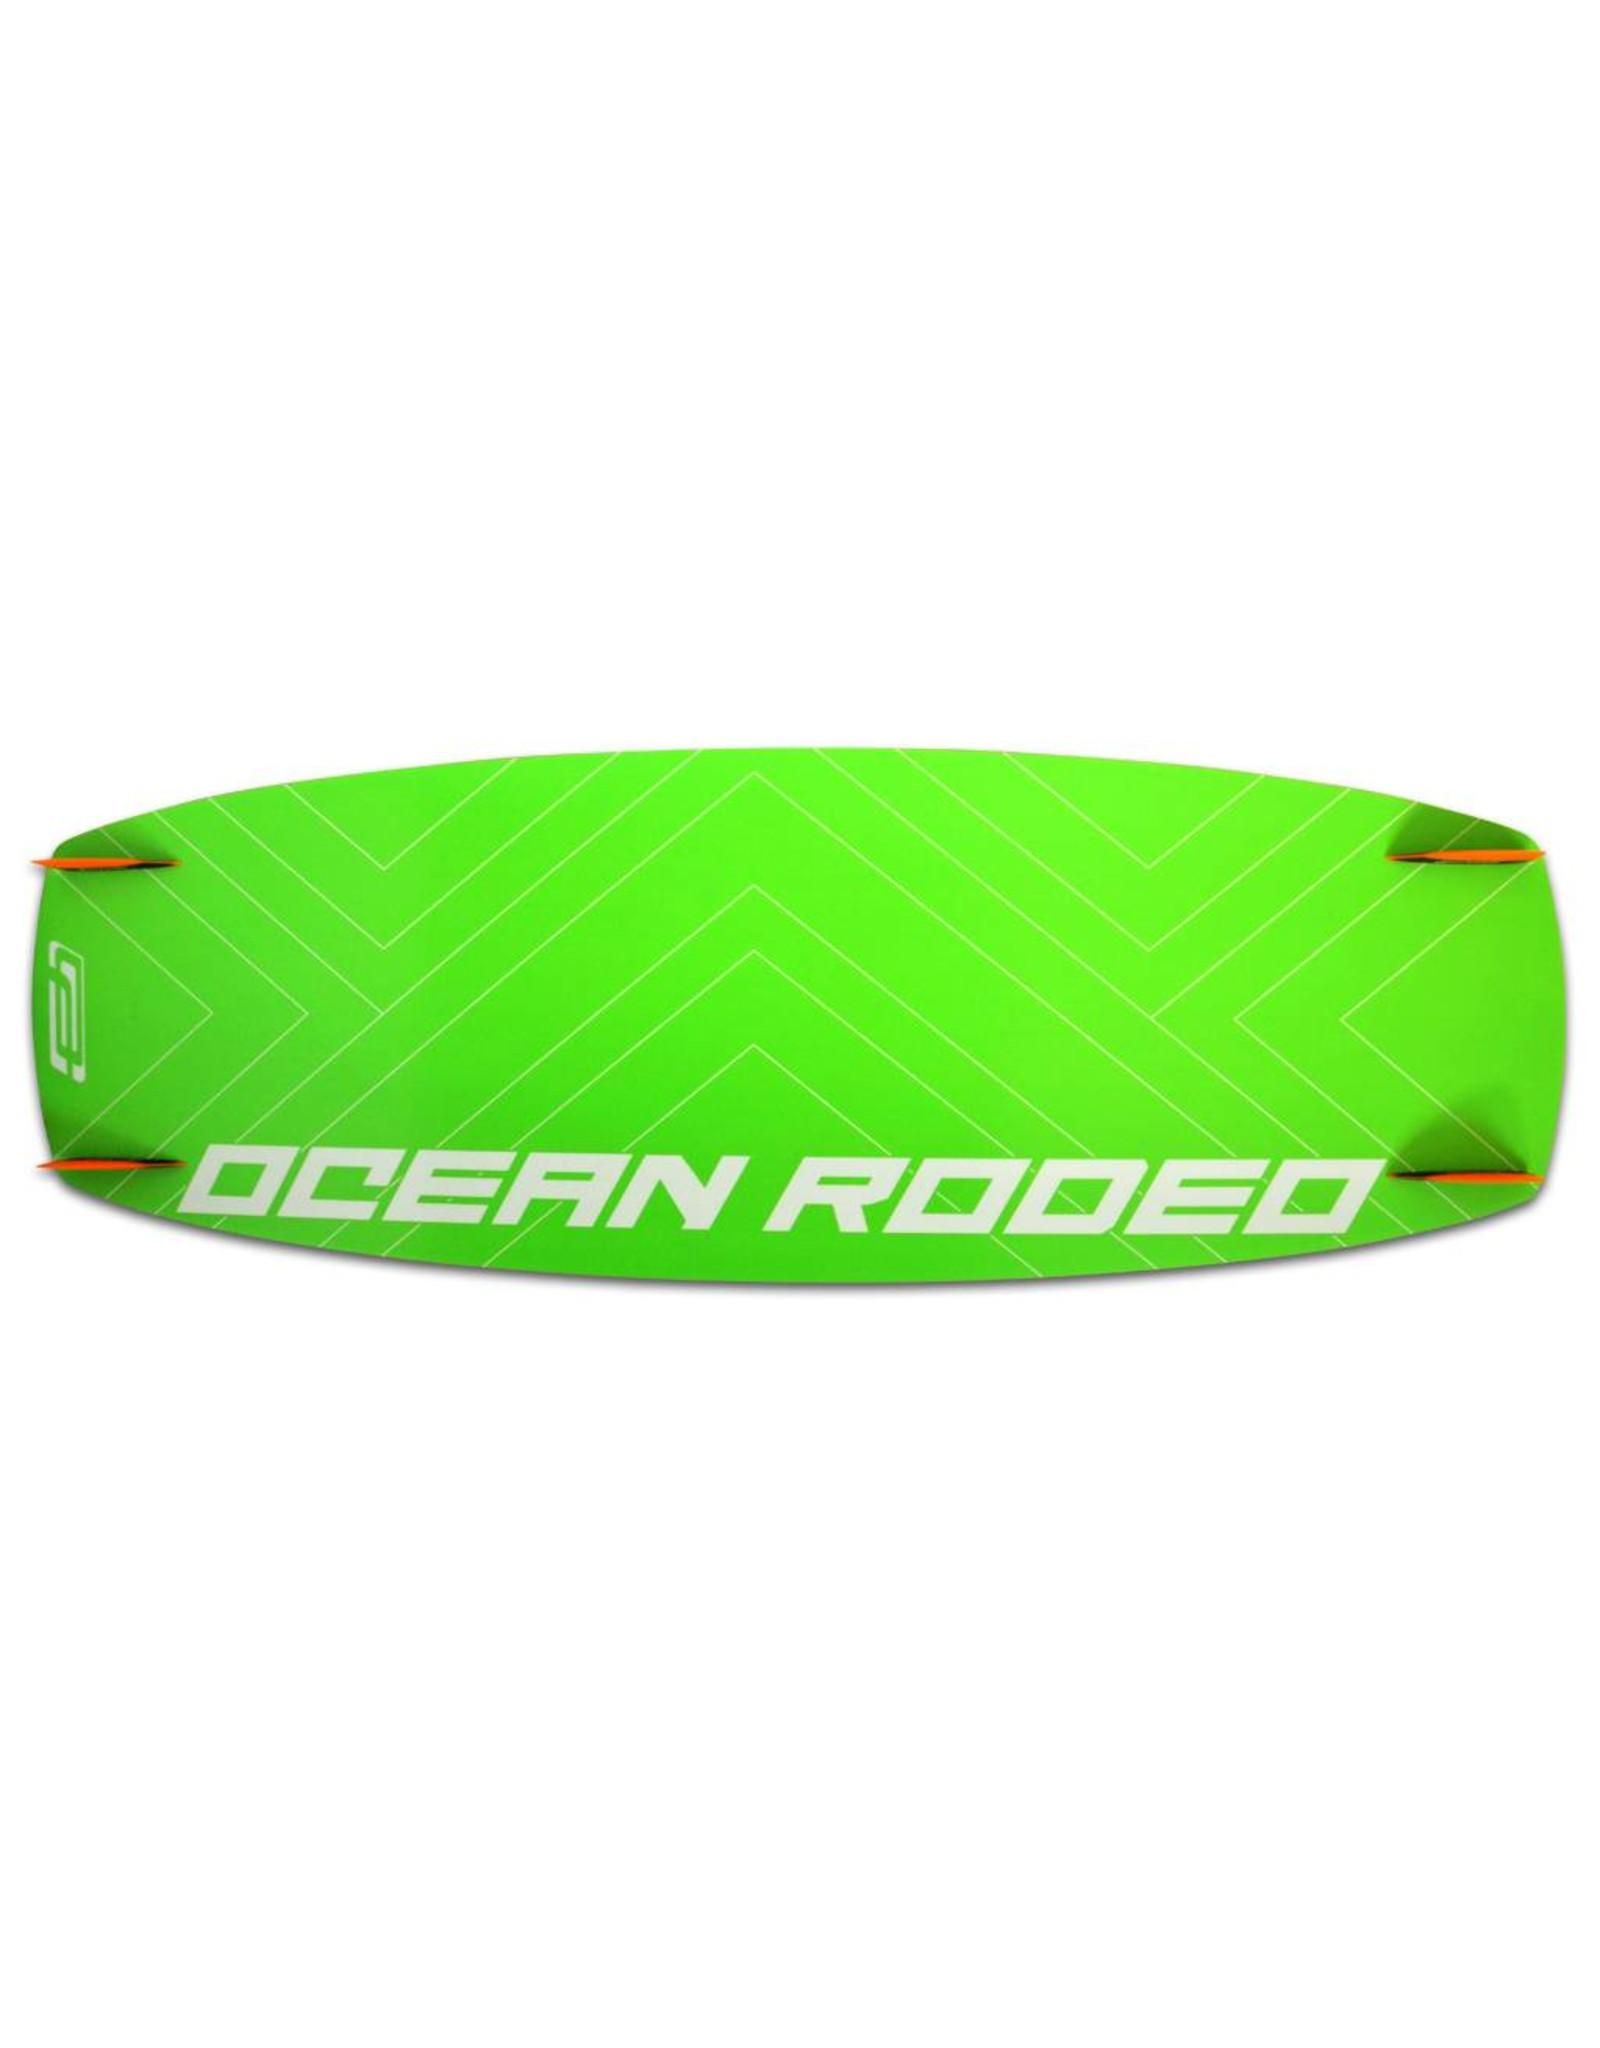 Ocean Rodeo Orgin, 142cm - Green / Black